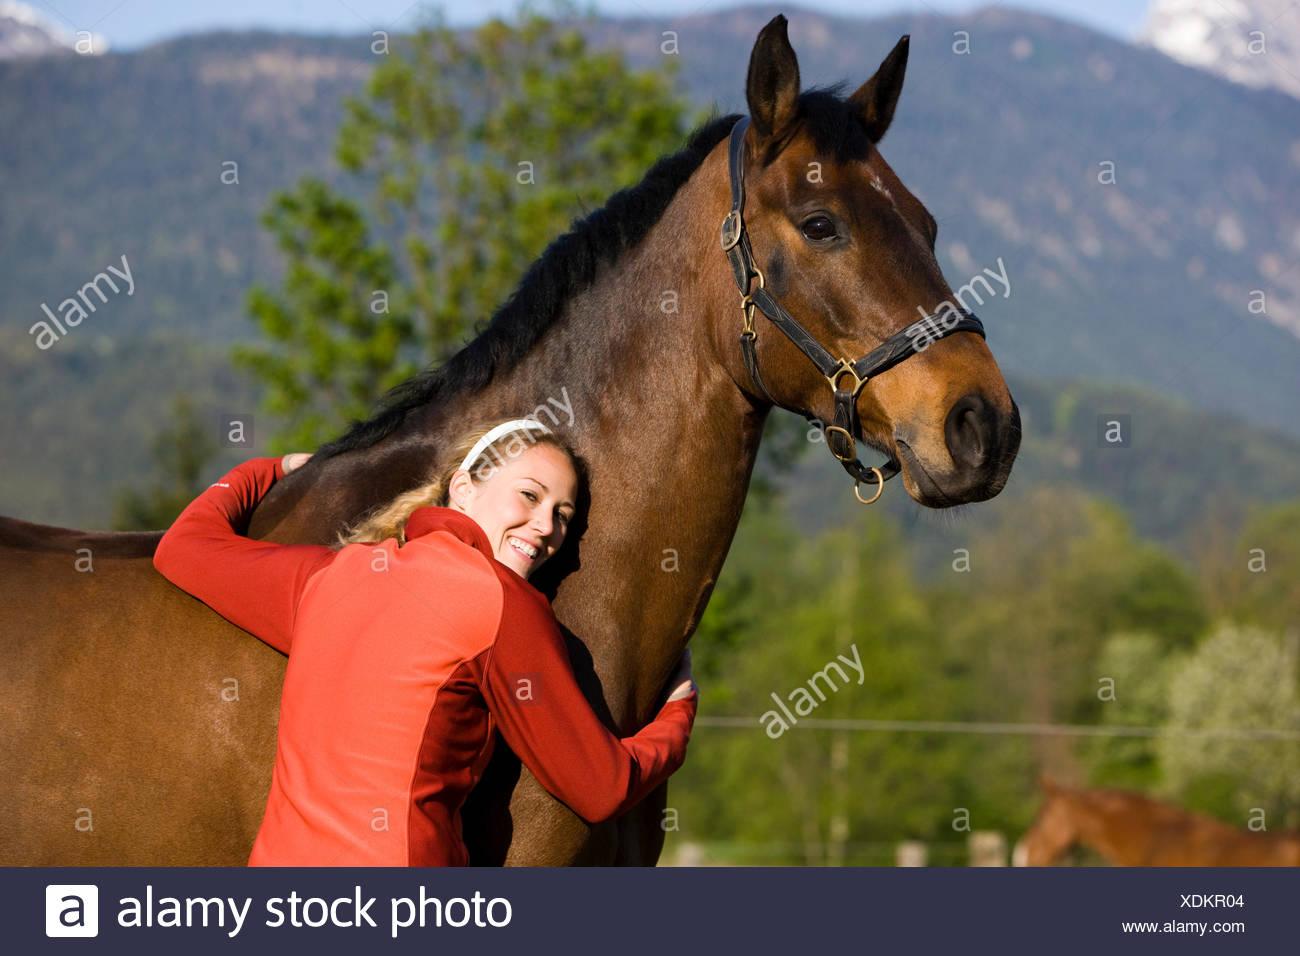 Young woman embracing an Austrian Warmblood, bay horse - Stock Image